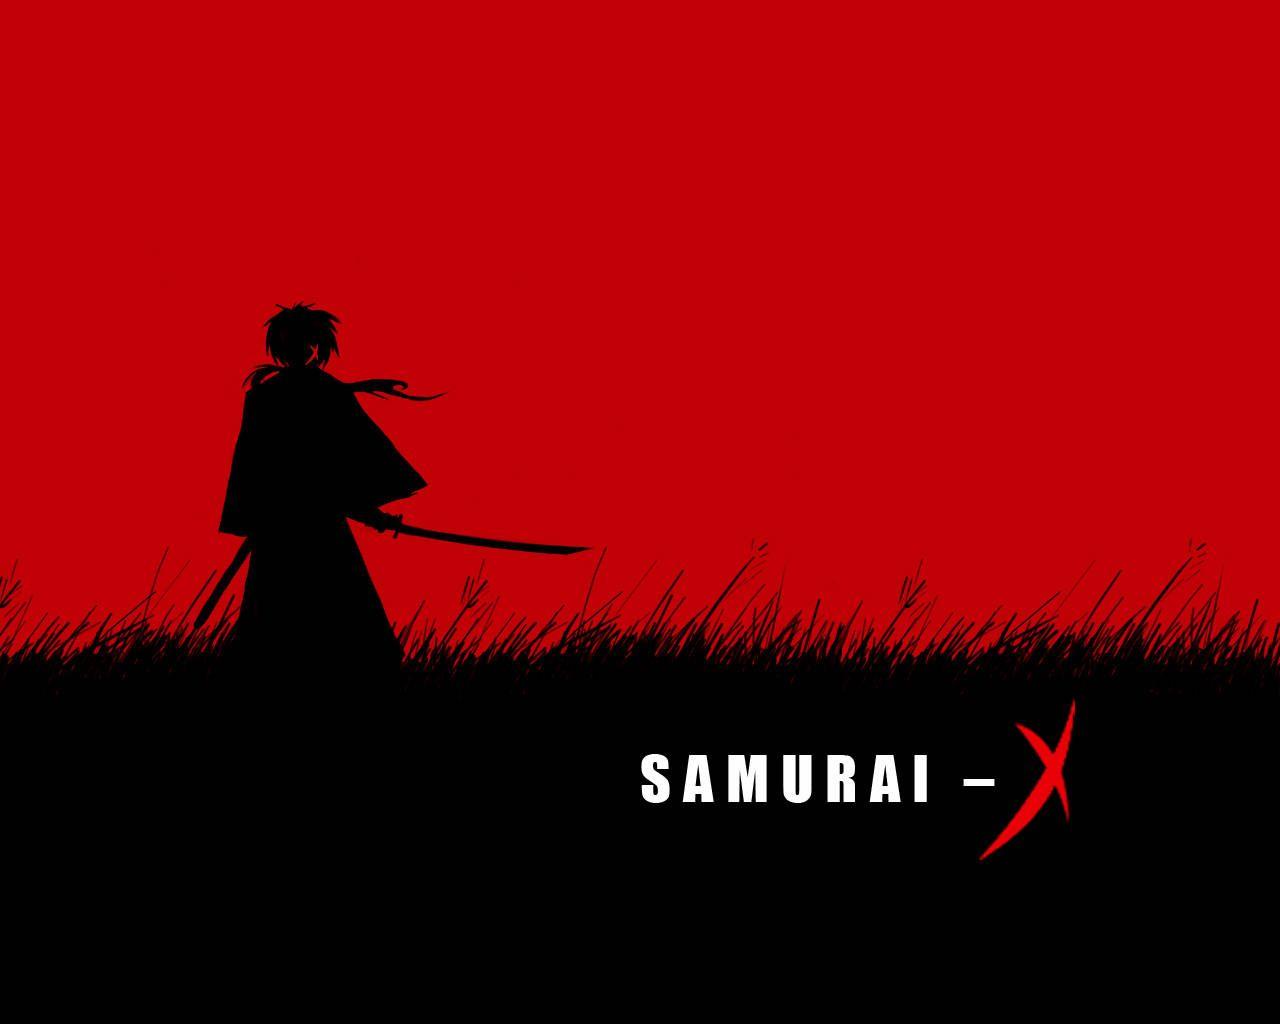 Samurai X Live Wallpaper Wallpaper